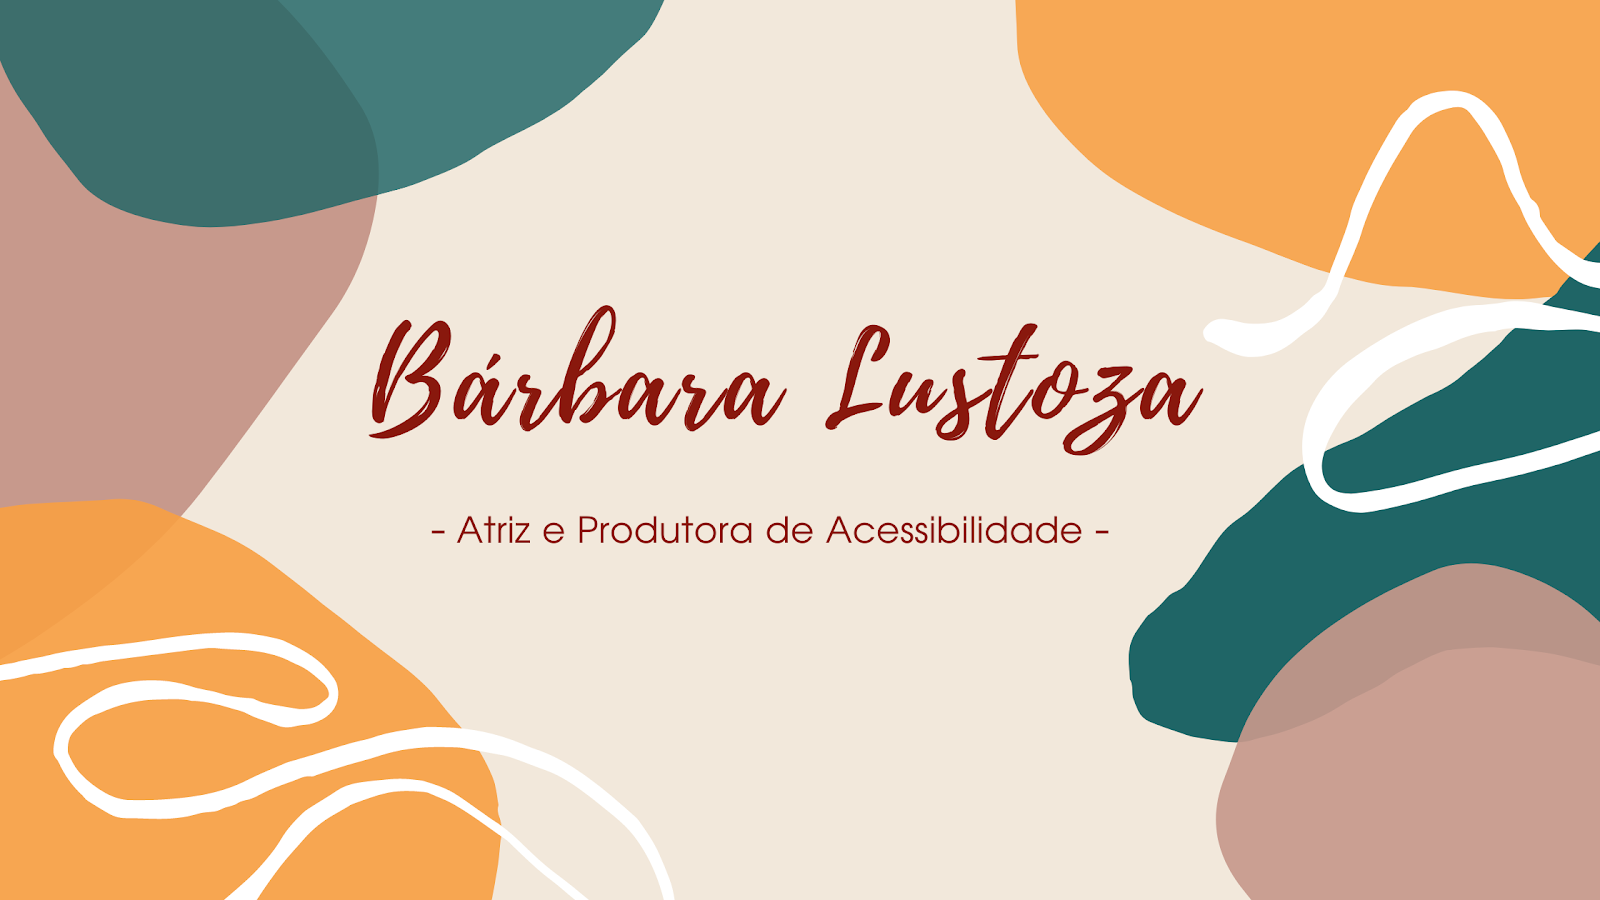 Bárbara Lustoza